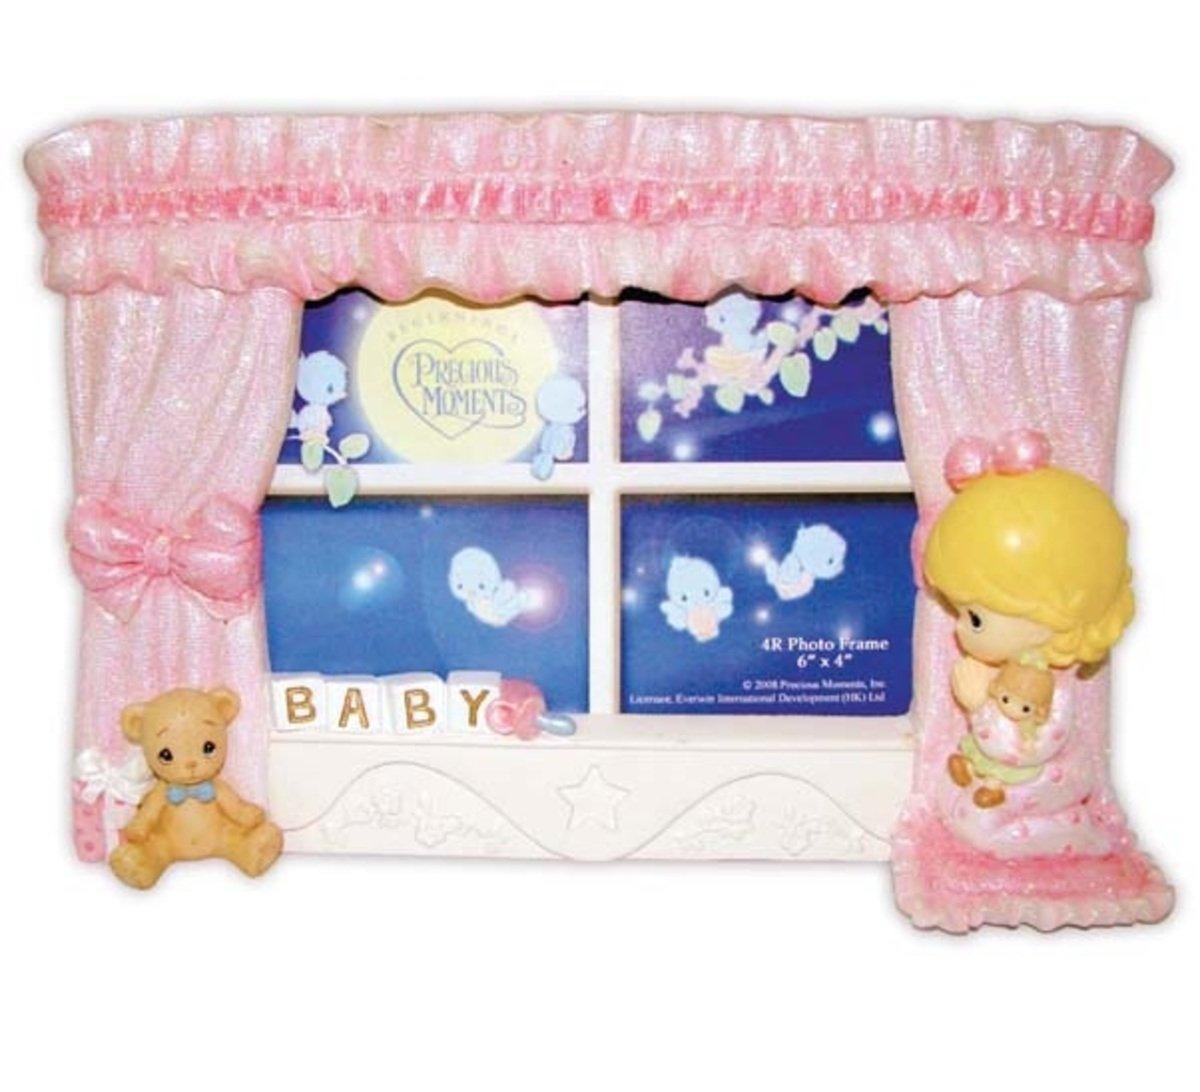 4R嬰兒相架 (Girl) - 4706